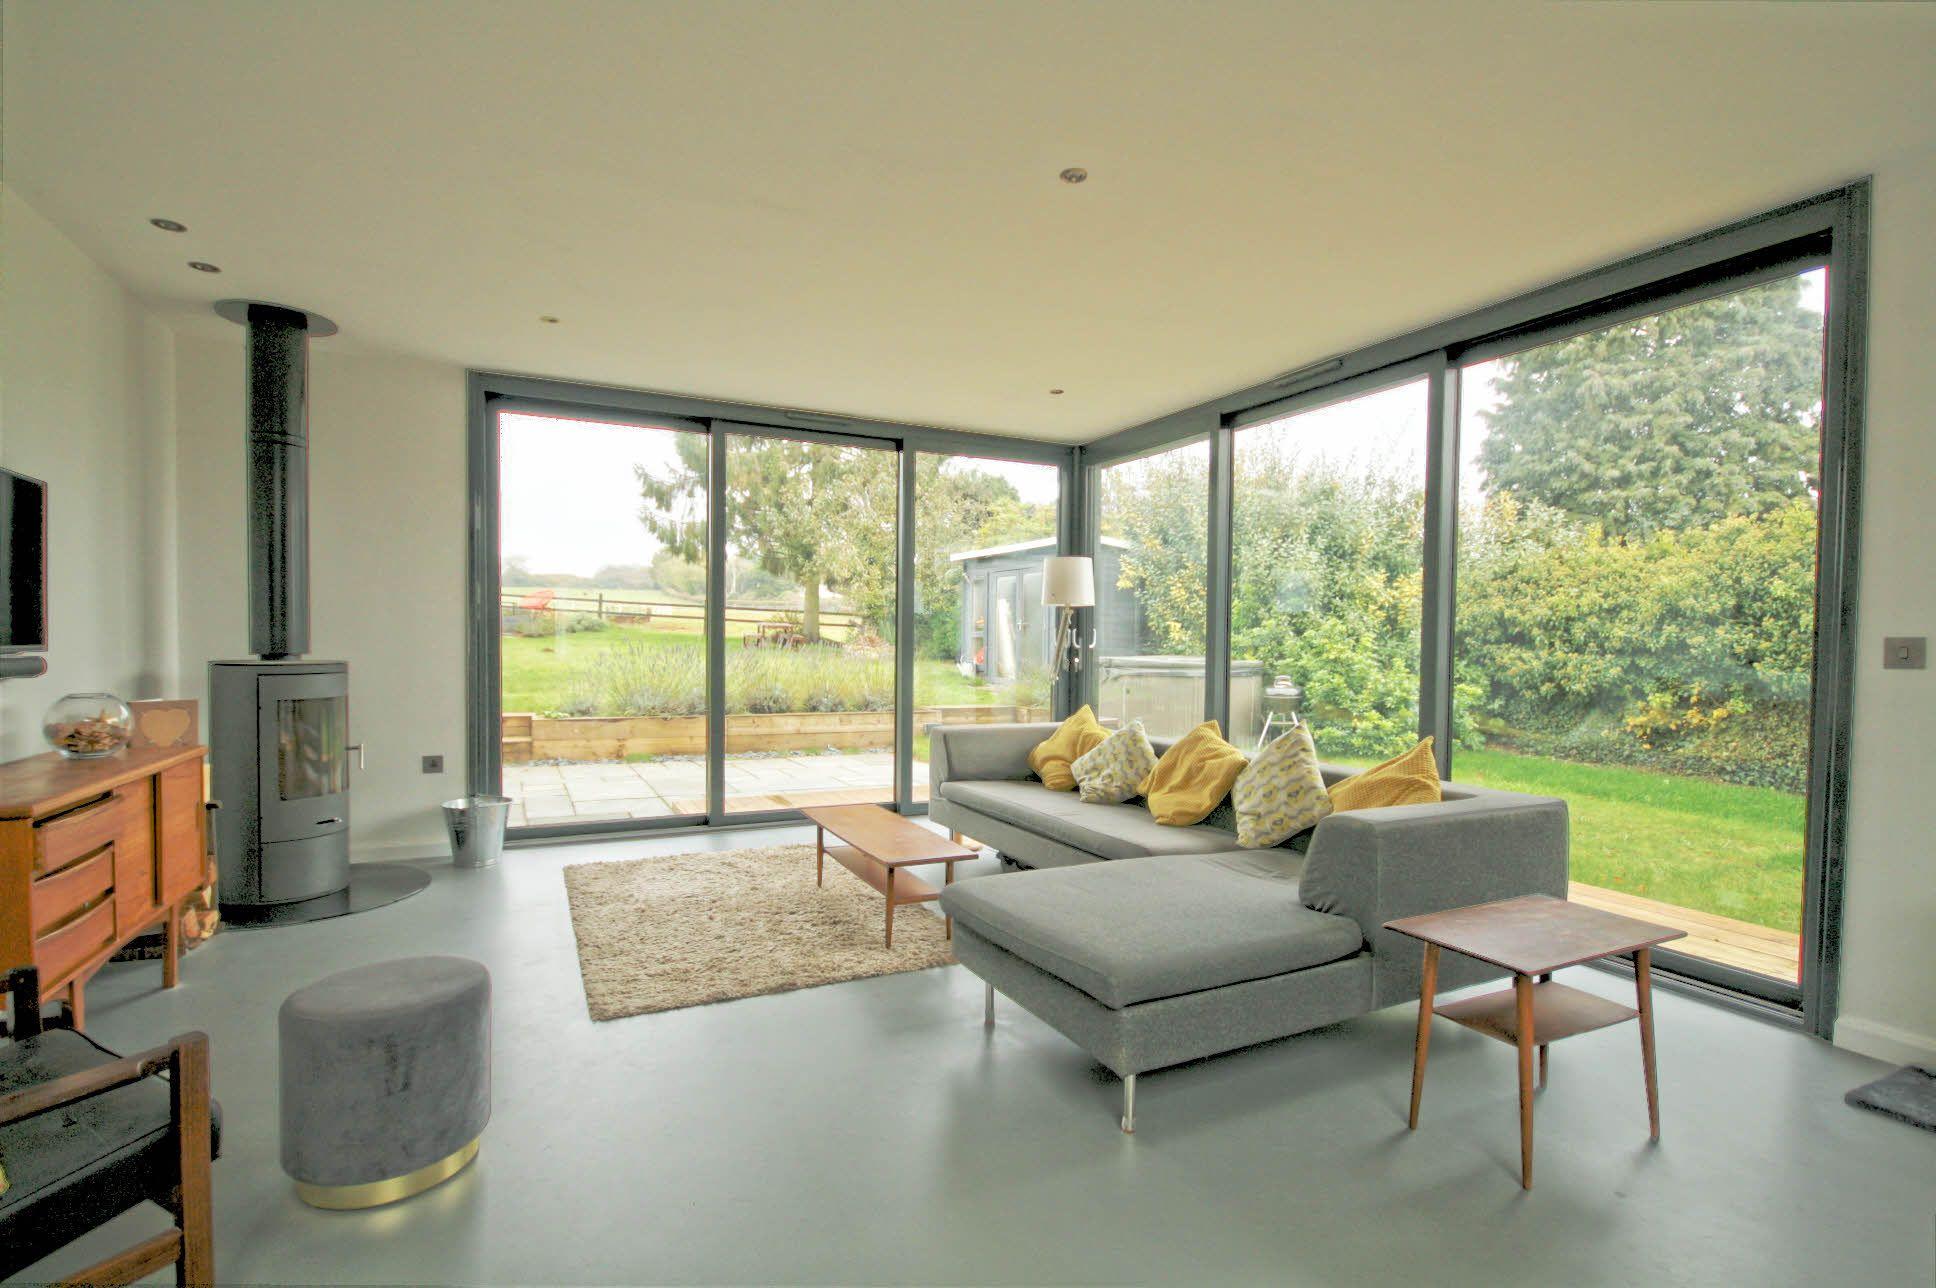 4 Bedroom Detached House For Sale - Sitting Room